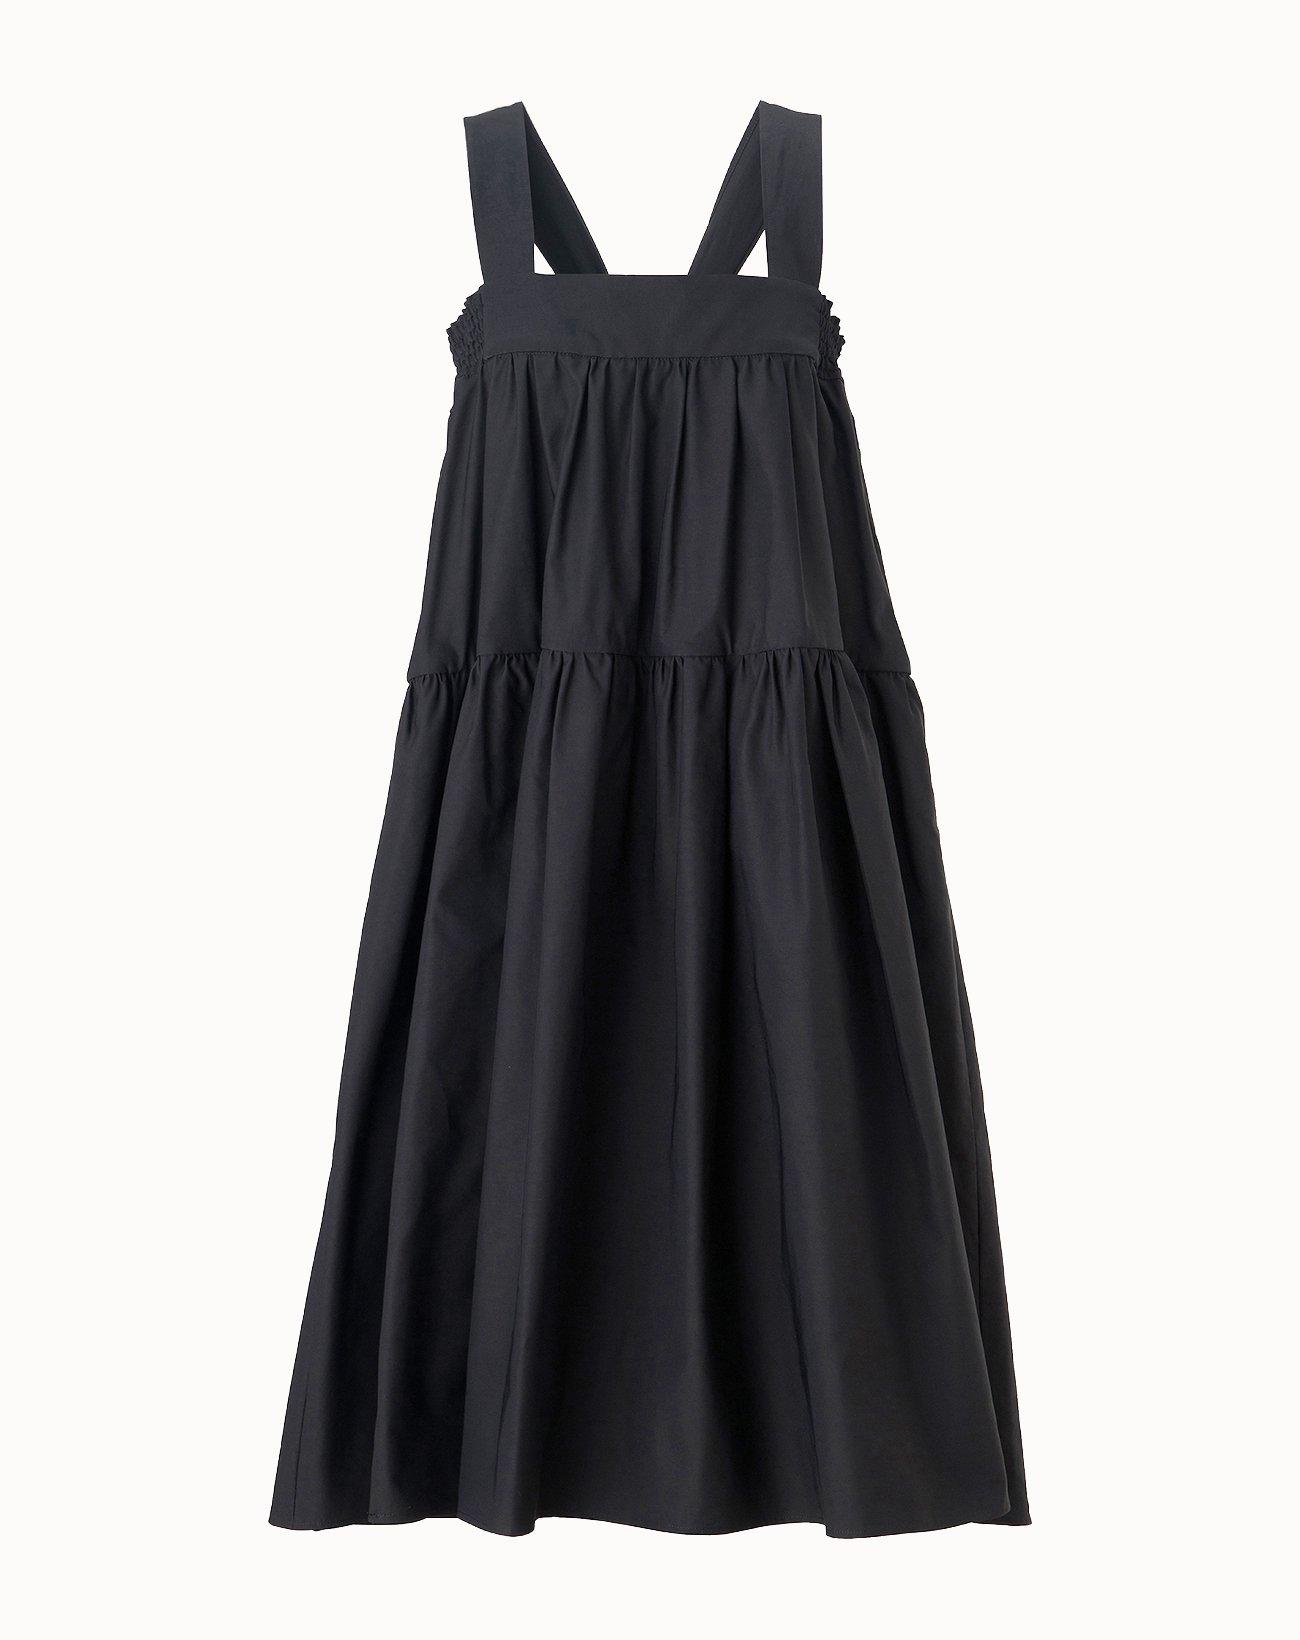 Vintage Twill Dress - Black